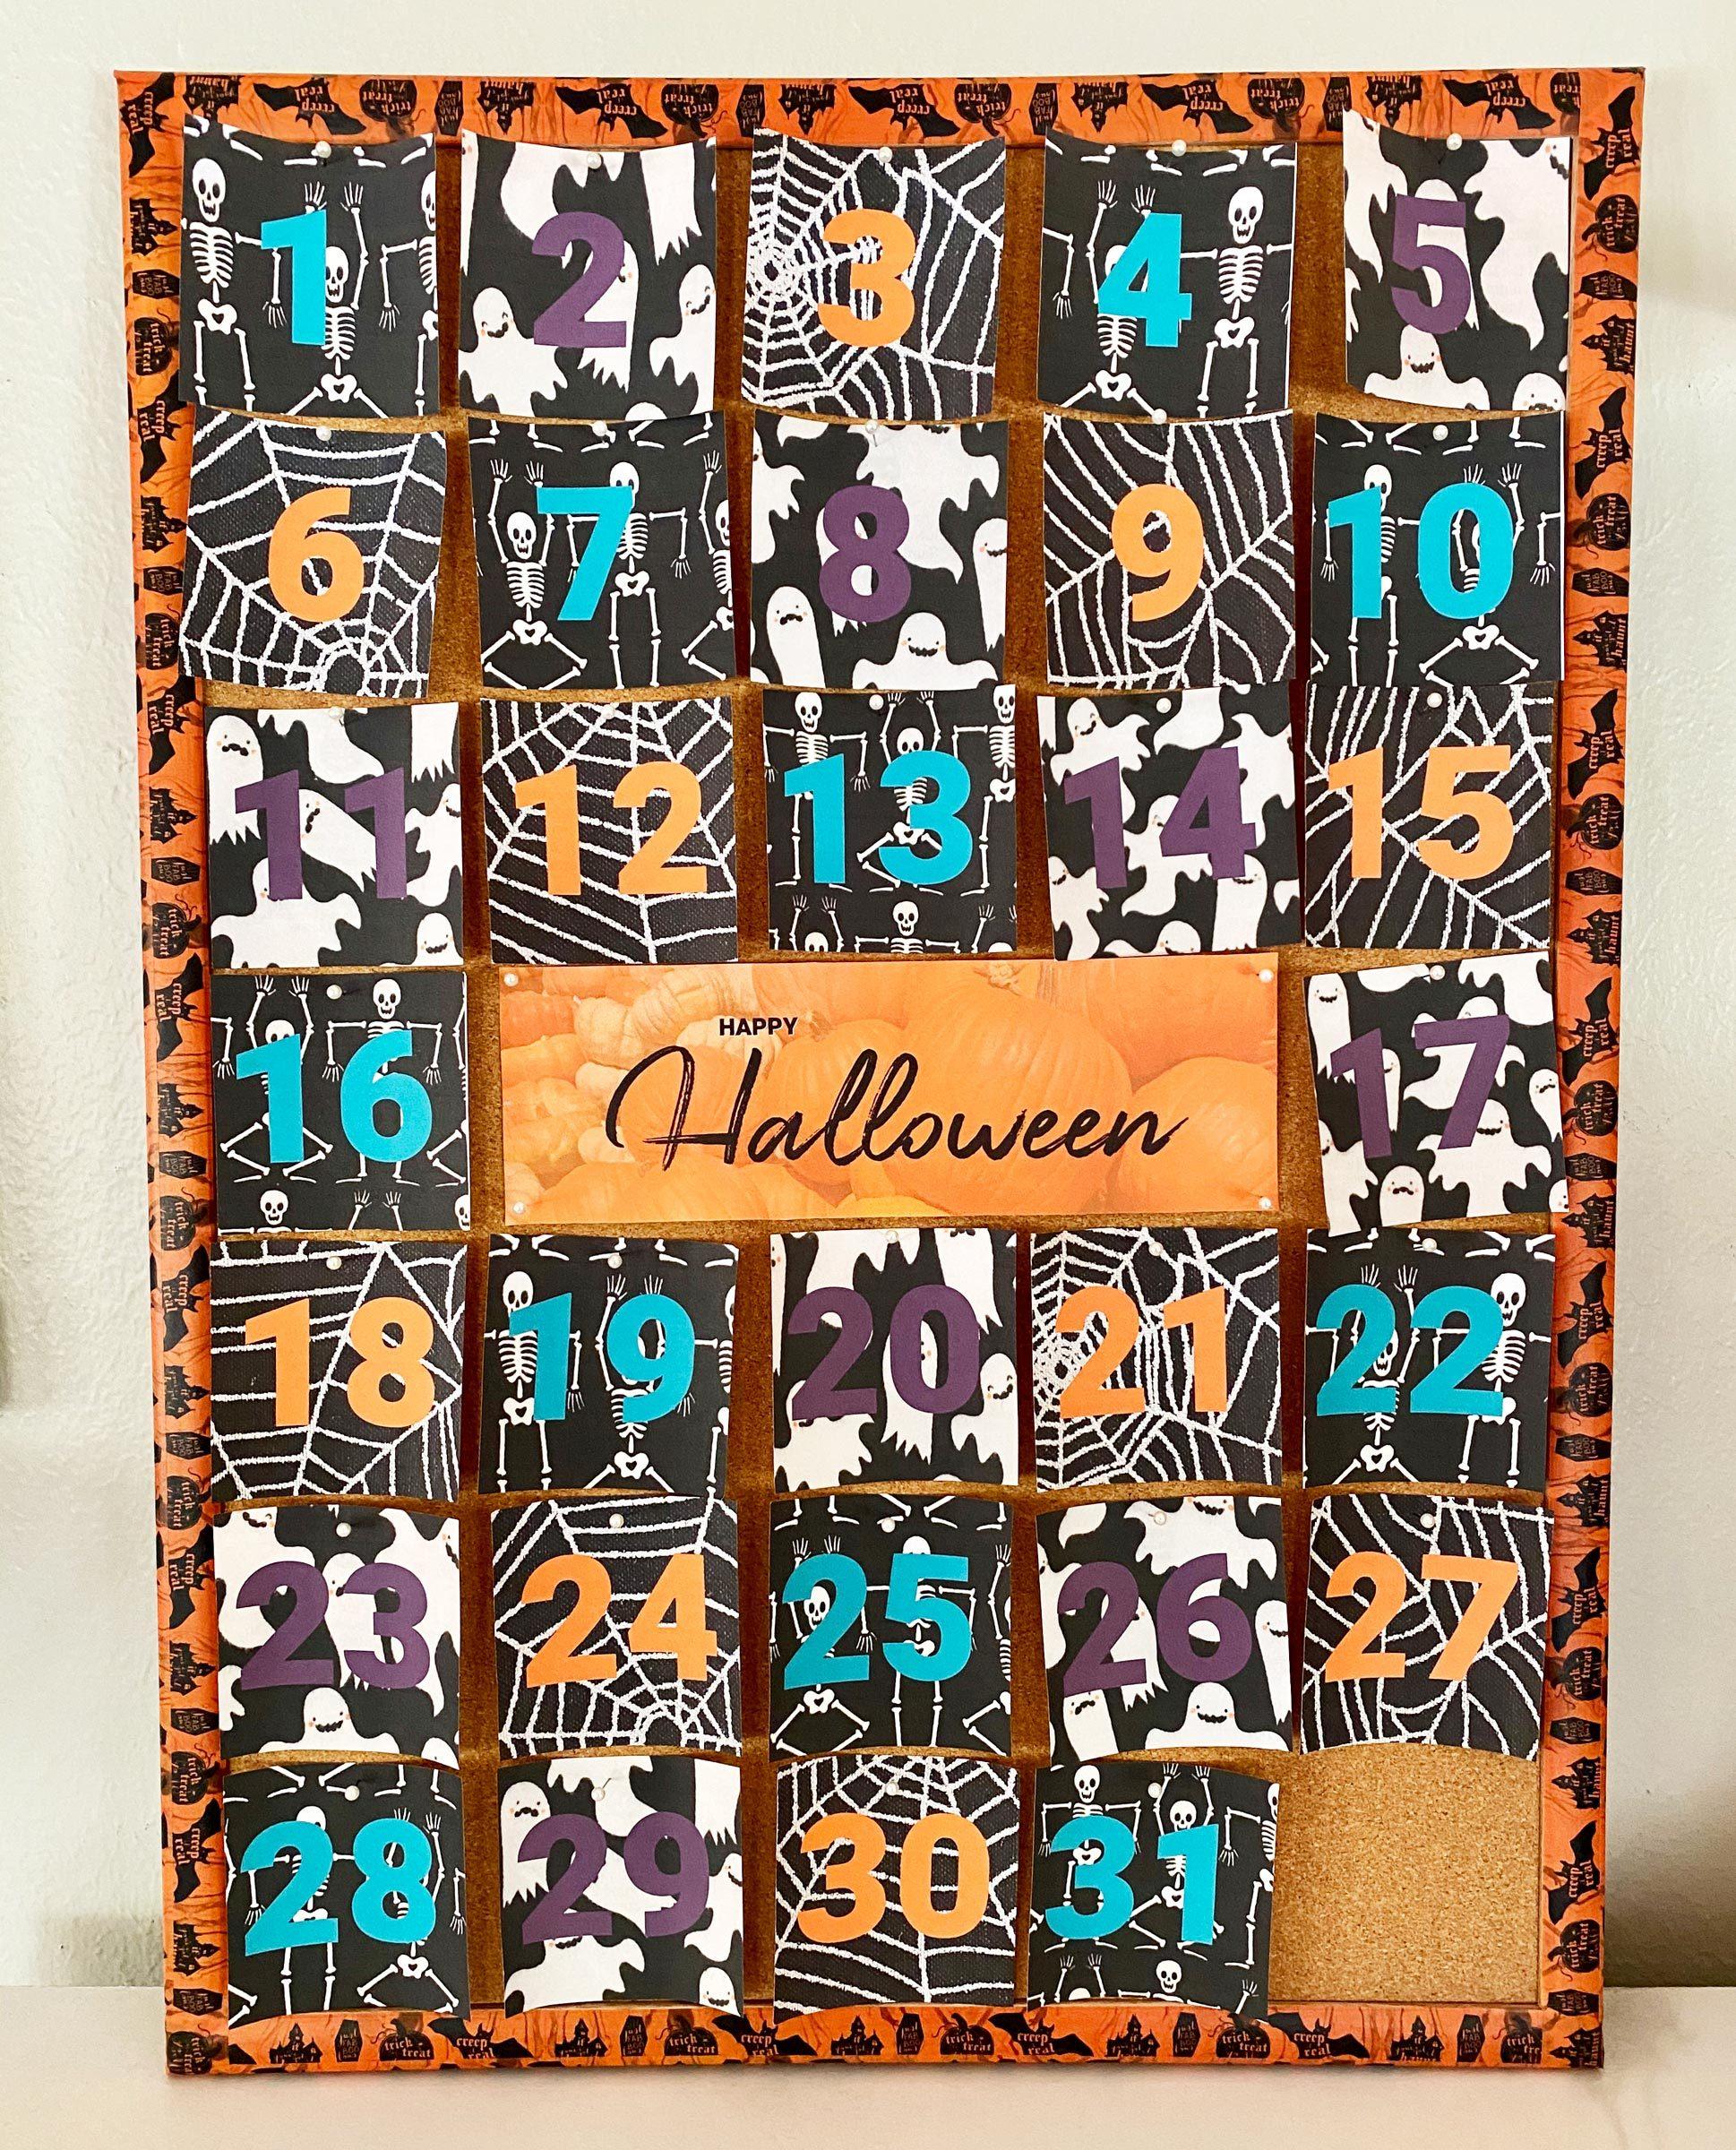 50 Diy Halloween Decorations Easy Inexpensive Ideas Cheap Halloween Decorations